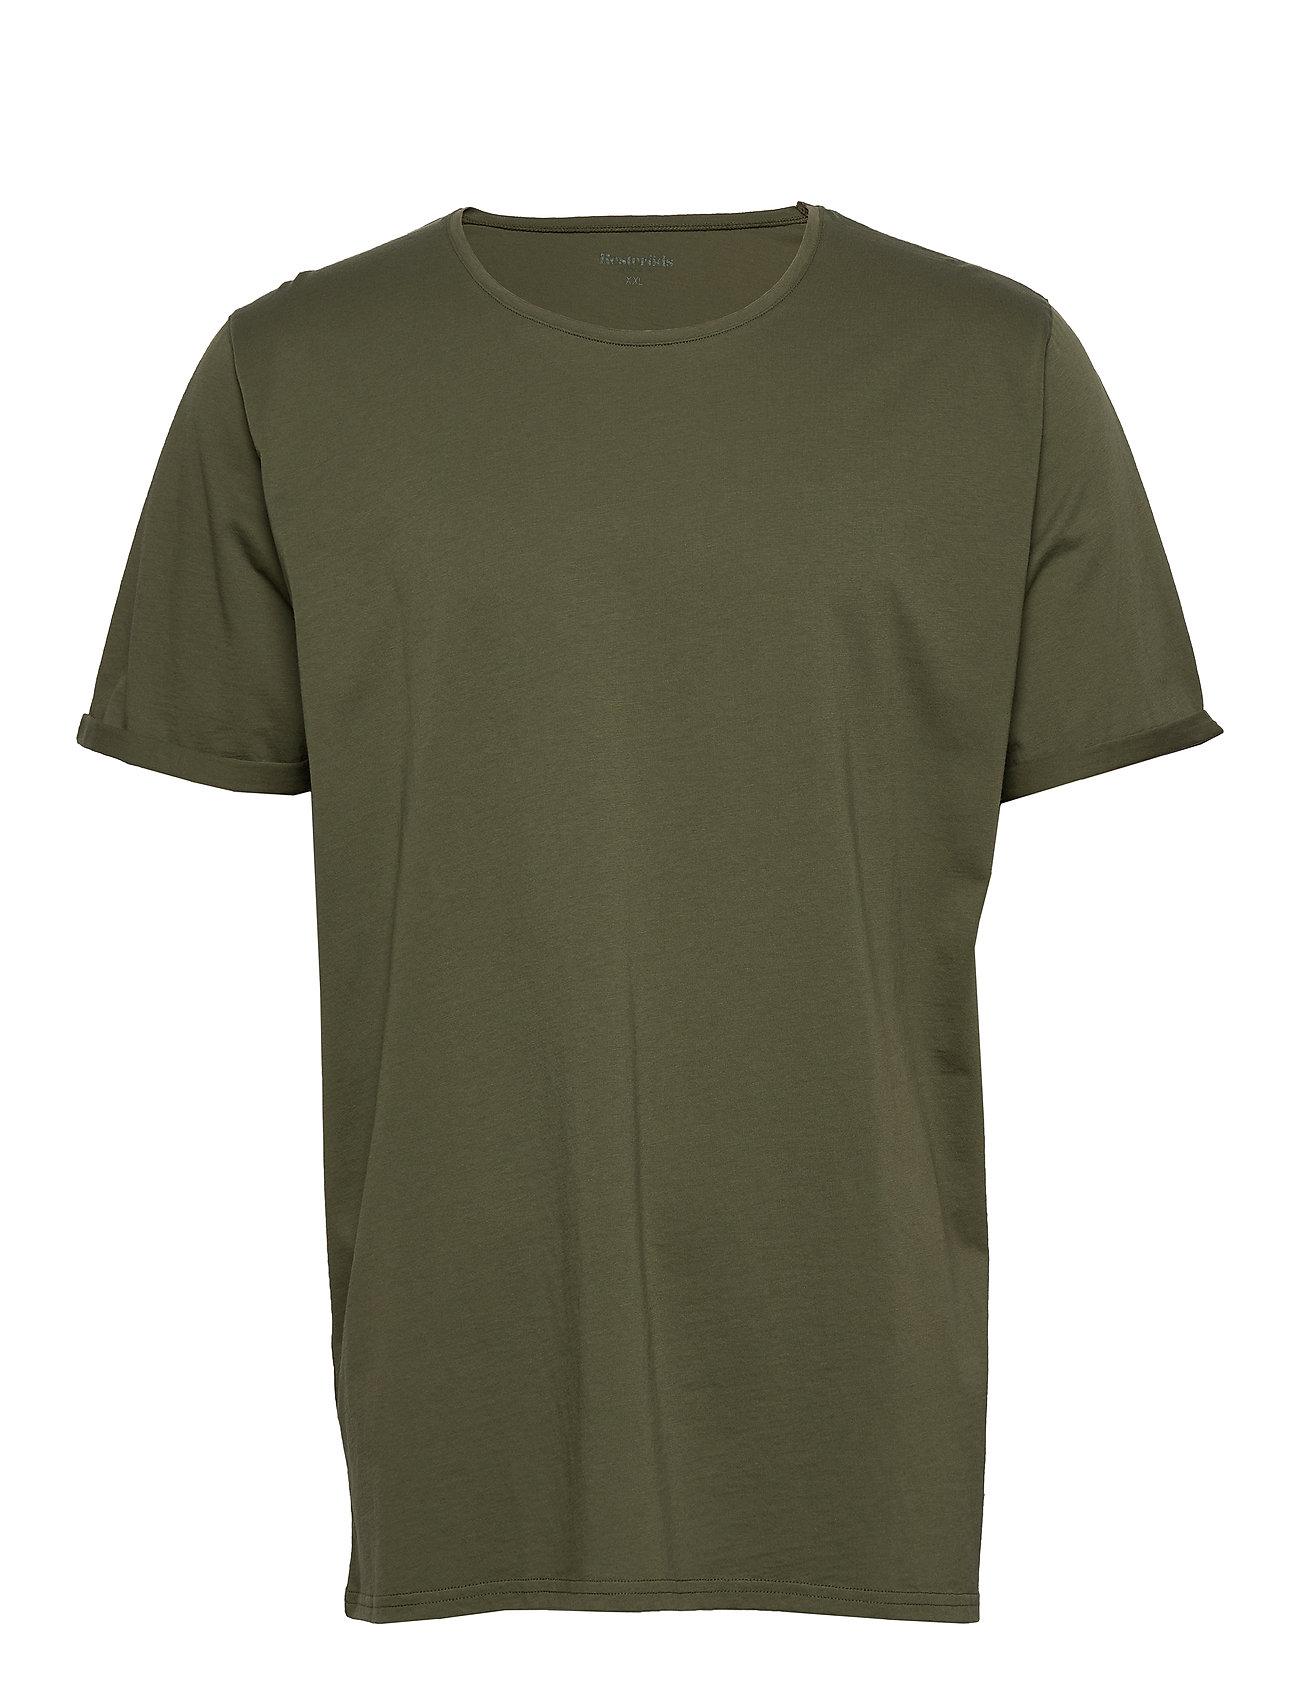 Image of Jimmy Solid T-shirt Resteröds (3378181279)